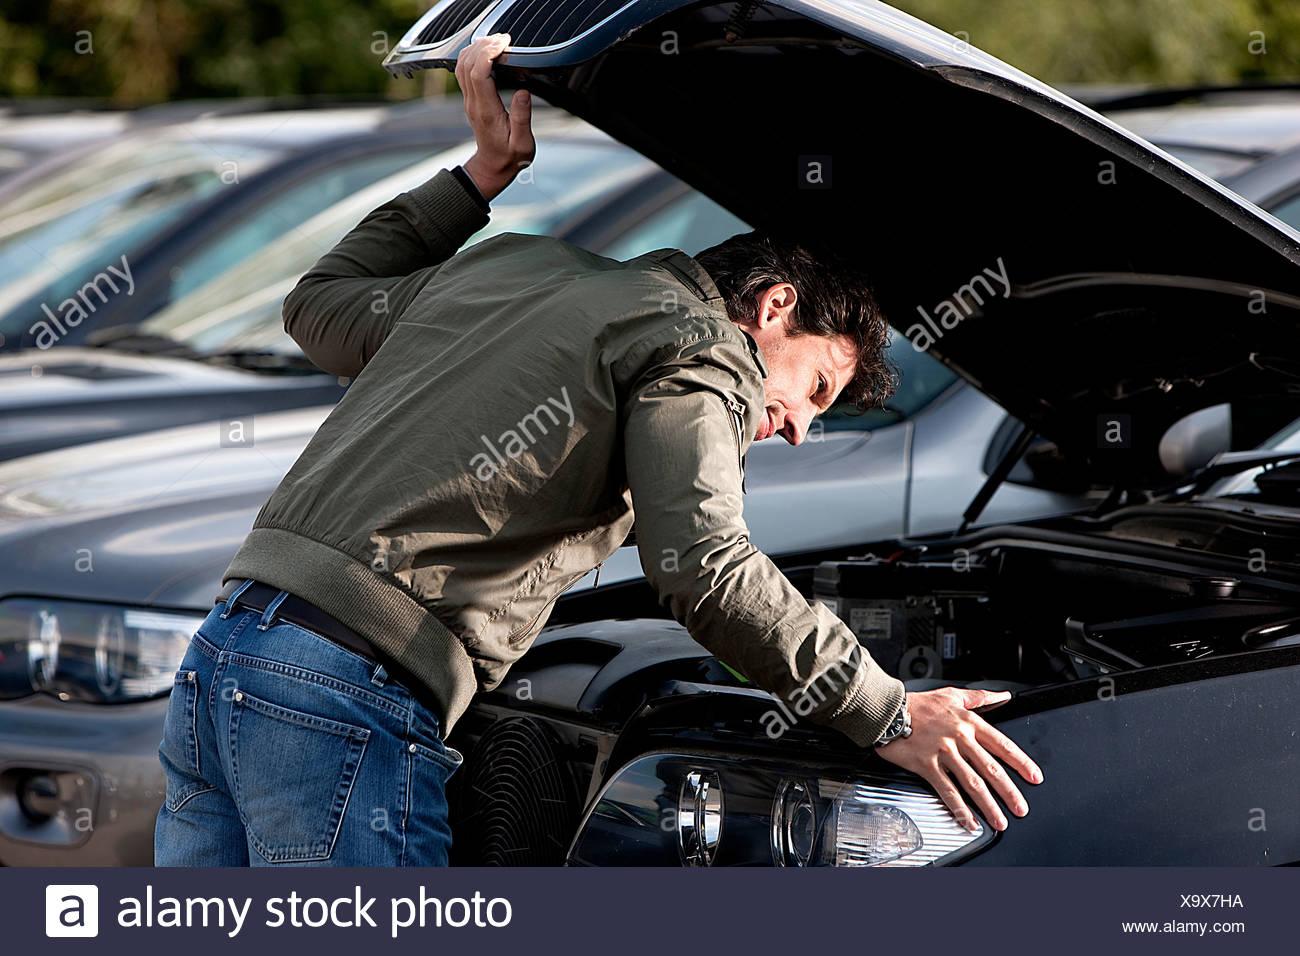 Local Car Dealer Inventory at NewCars.com